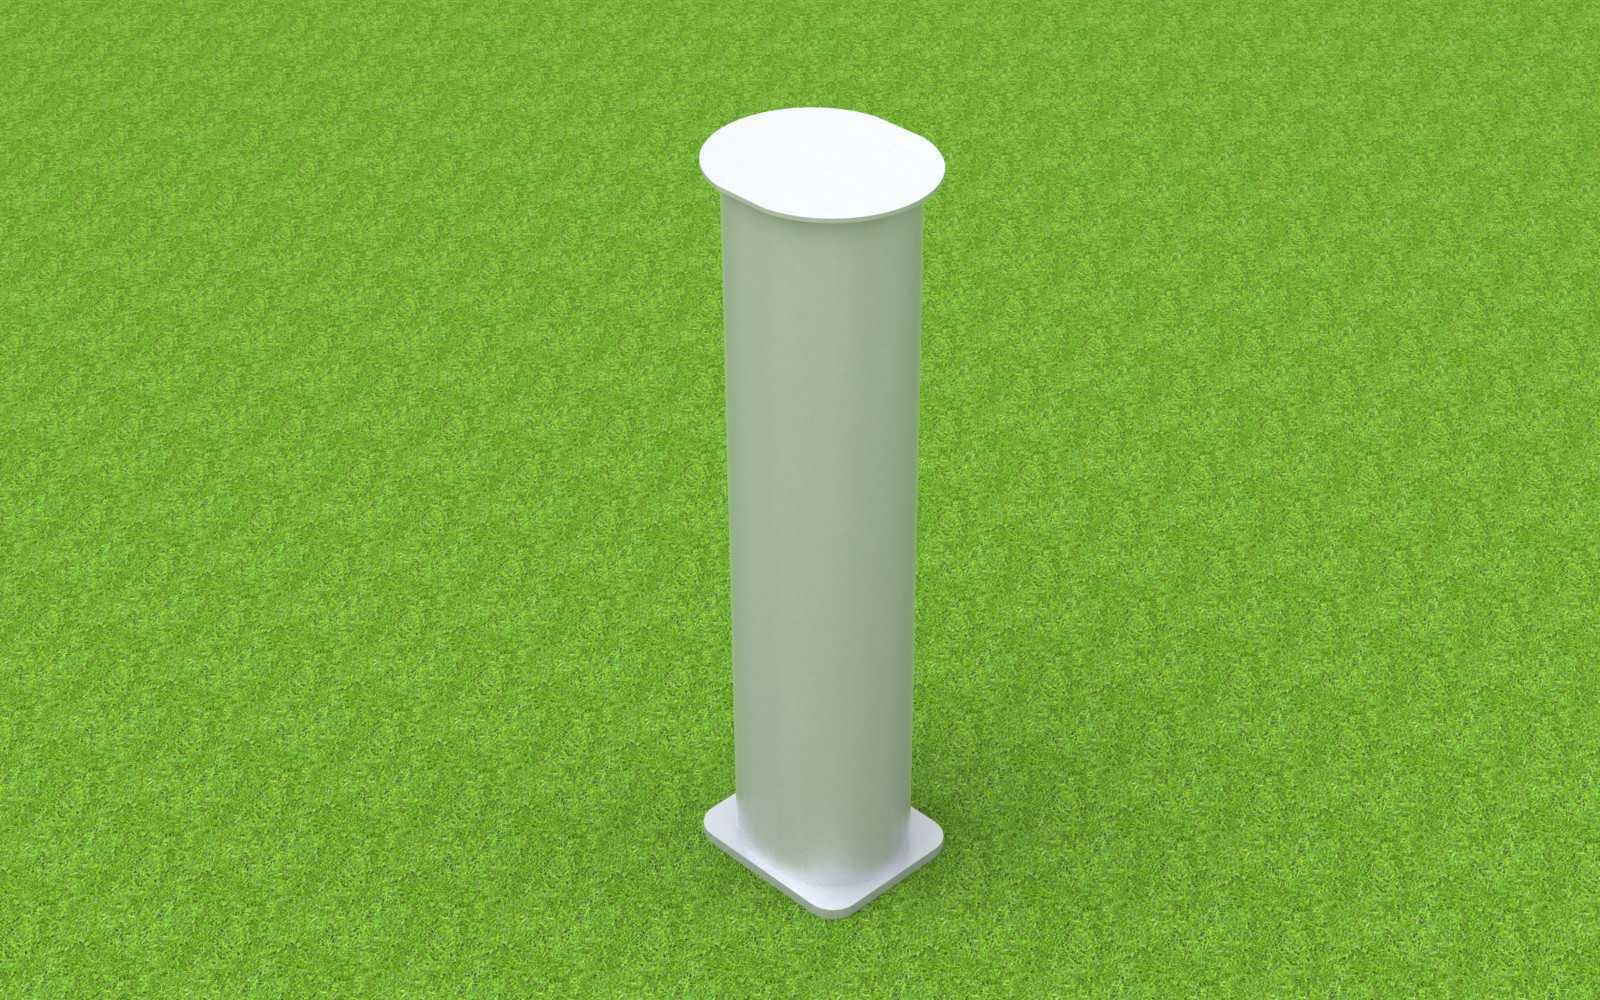 Bodenhülse Standard für Fußballtore (Profil 100 x 120 mm), mit losem Deckel